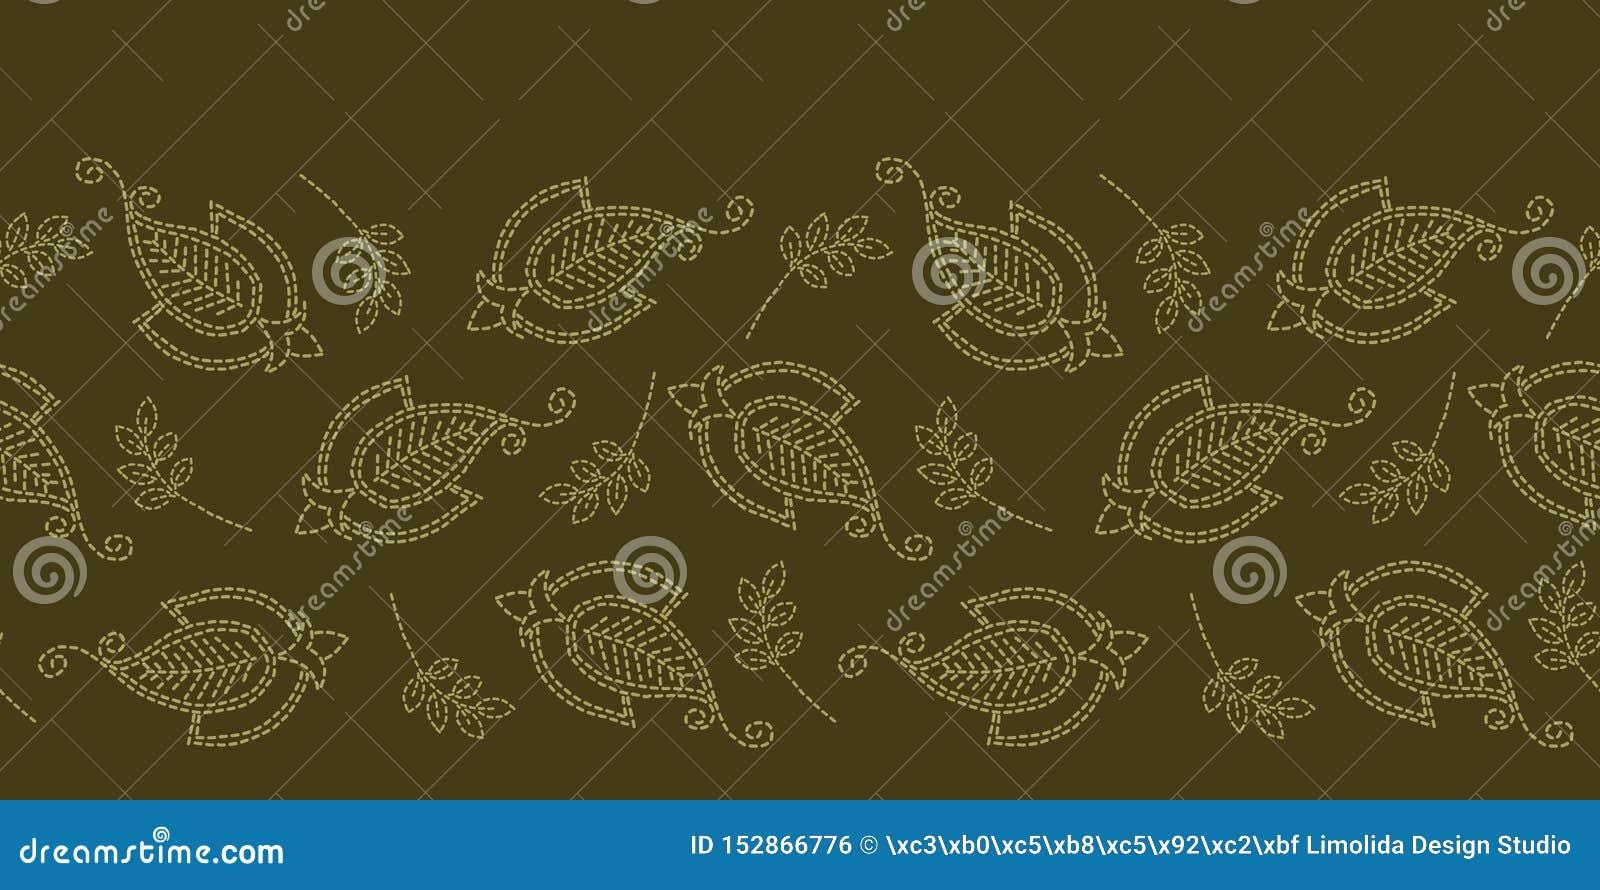 Граница идущим стежком мотива Пейсли флористических лист Картина вектора викторианского needlework безшовная Рука сшила boteh